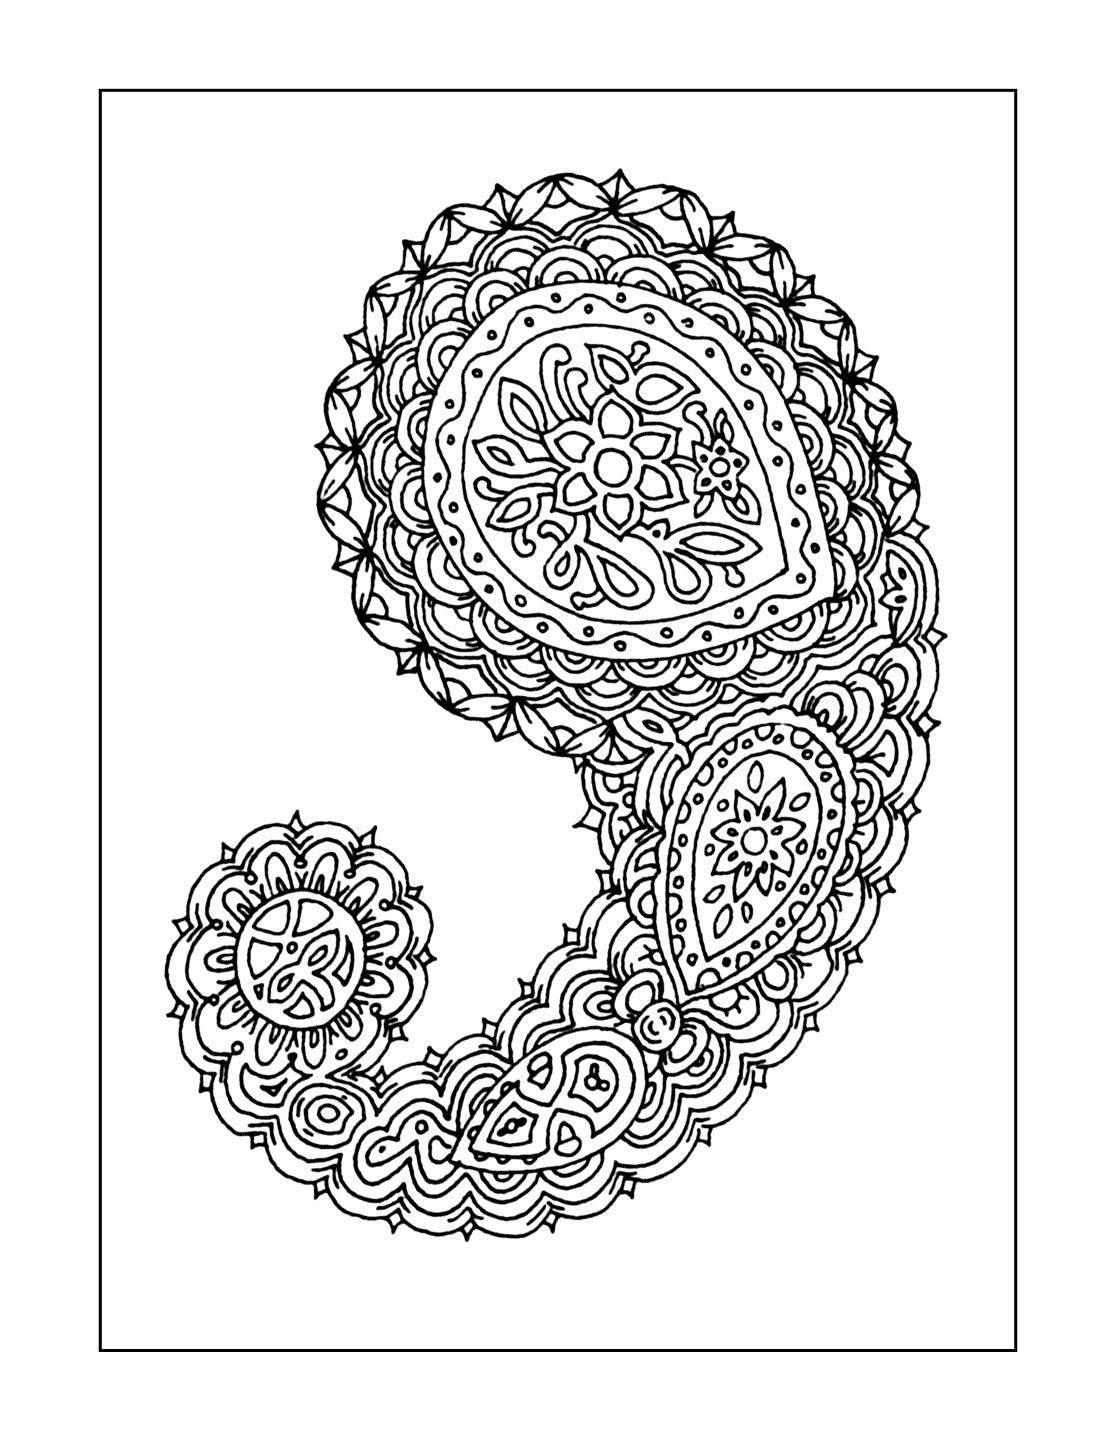 Single Paisley Coloring Page